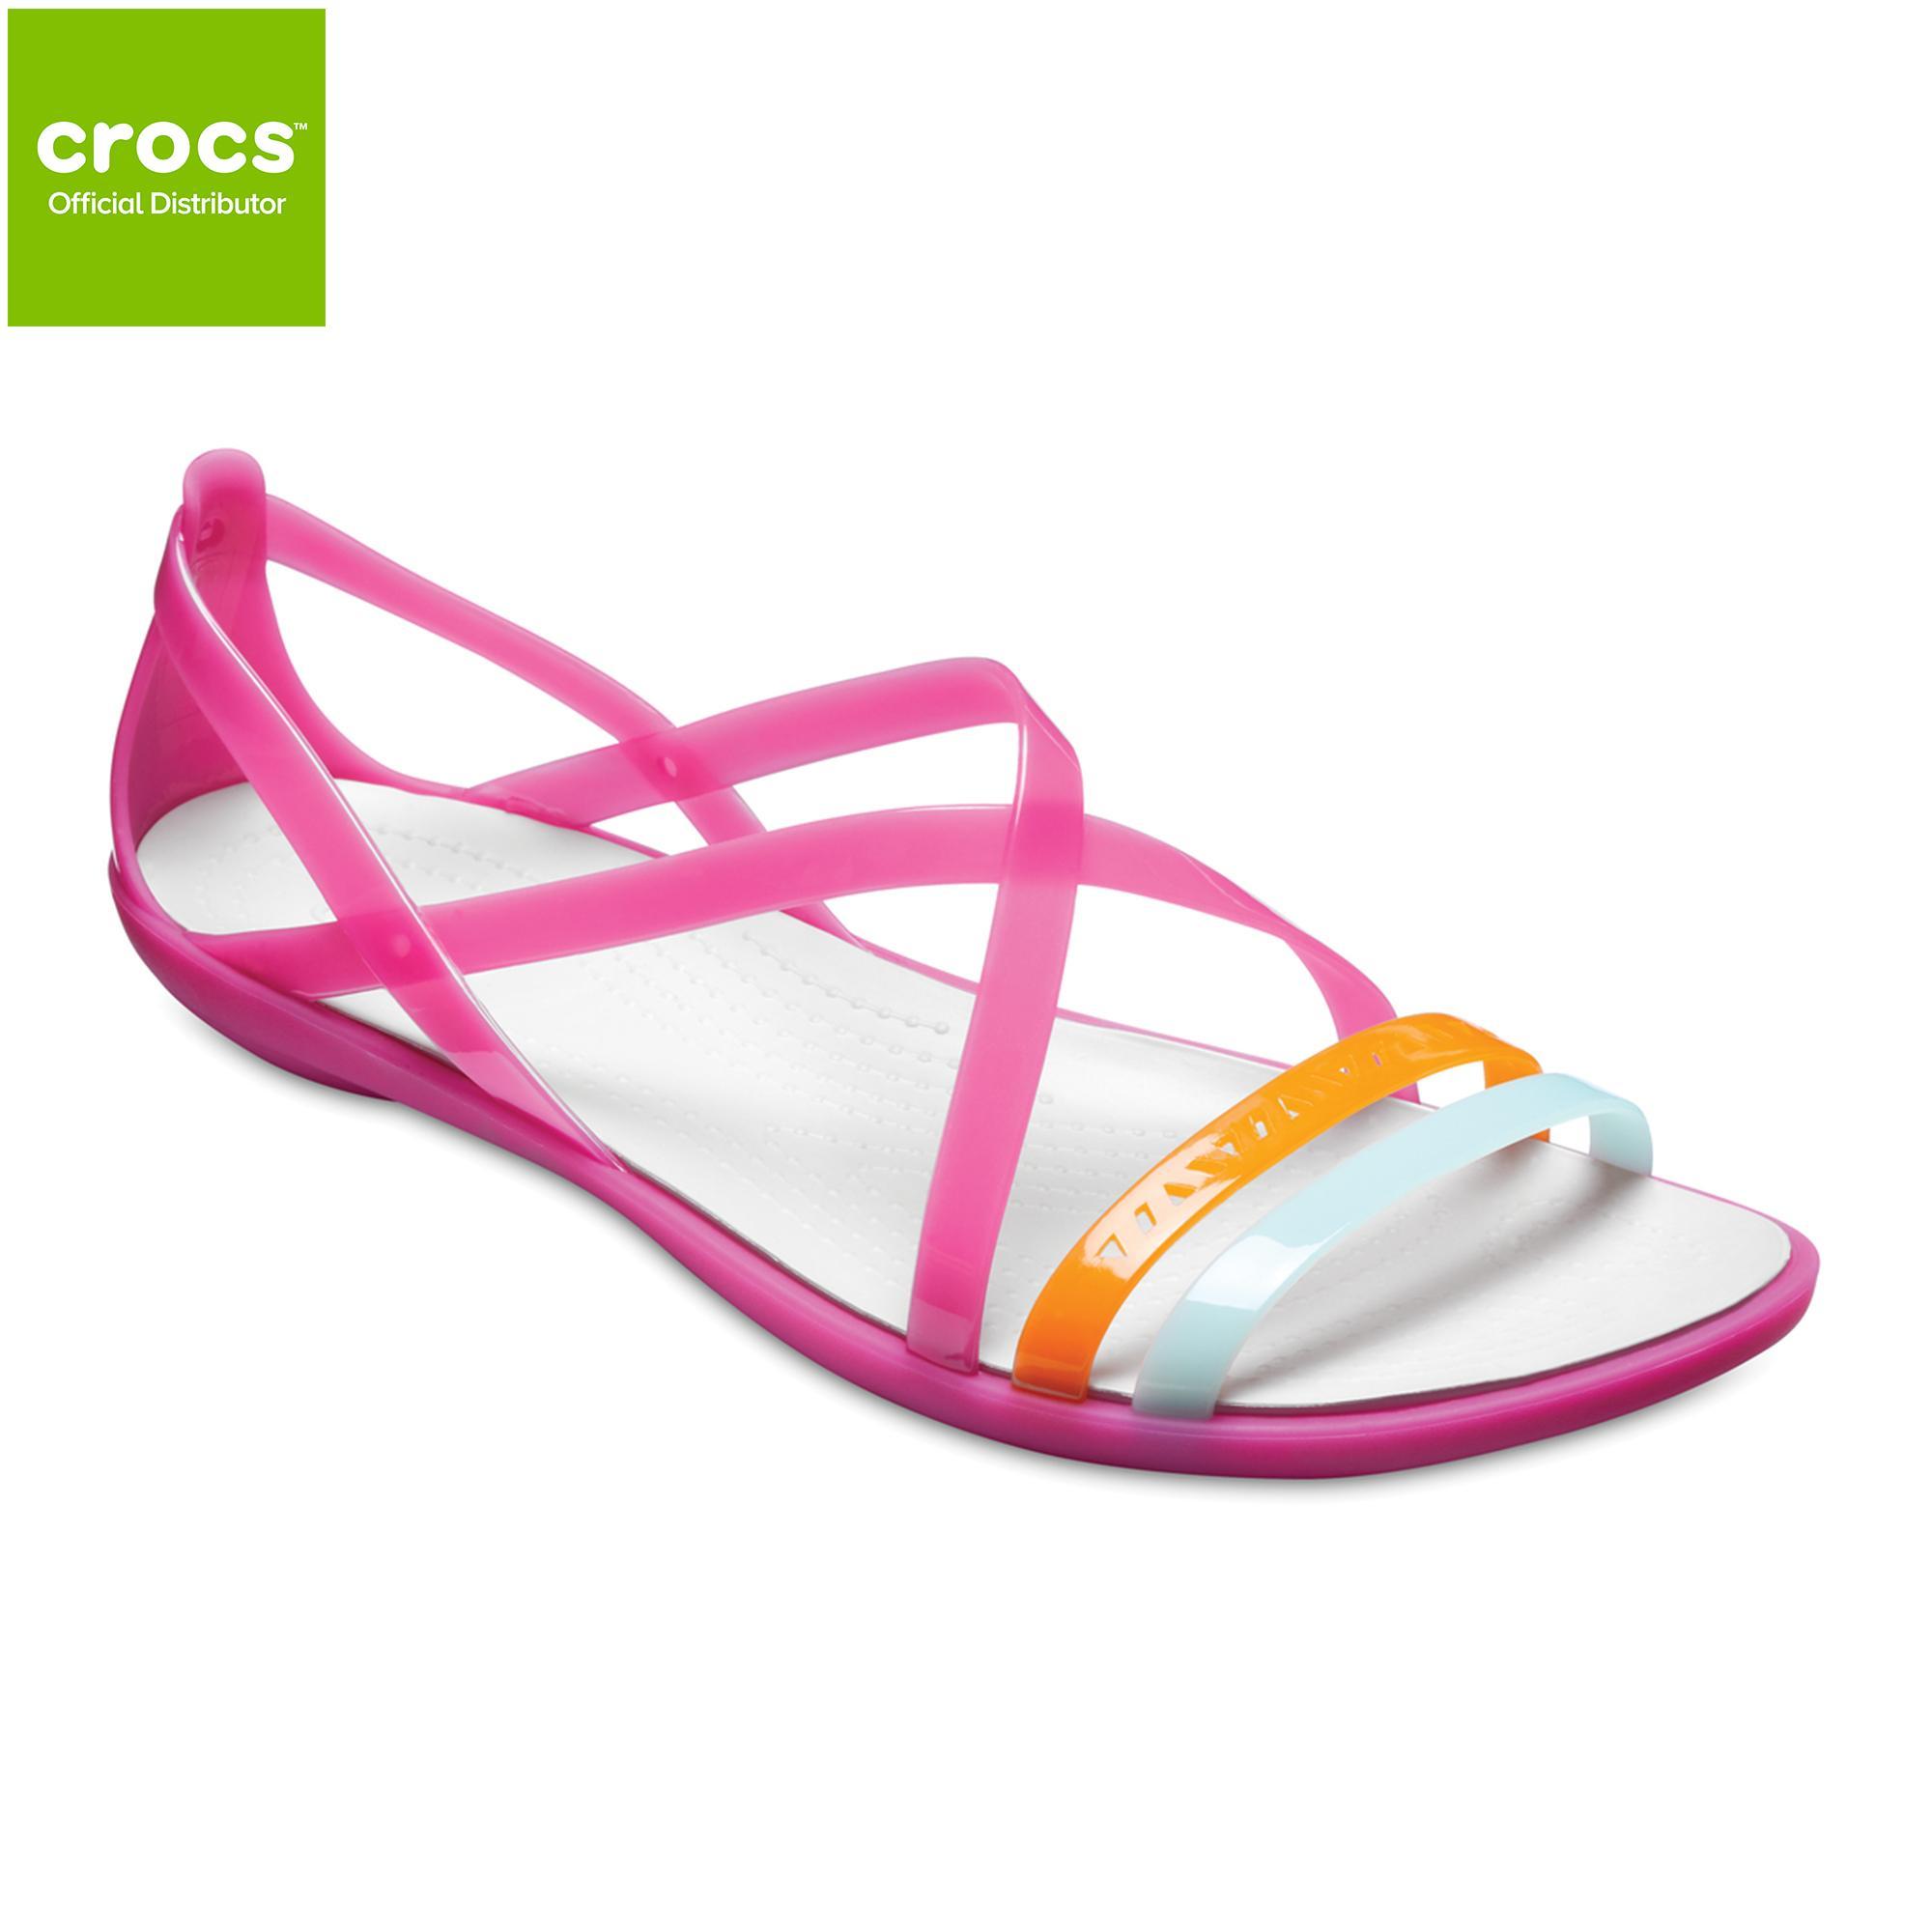 574f8cfbfd6ab5 Crocs Philippines  Crocs price list - Crocs Flats